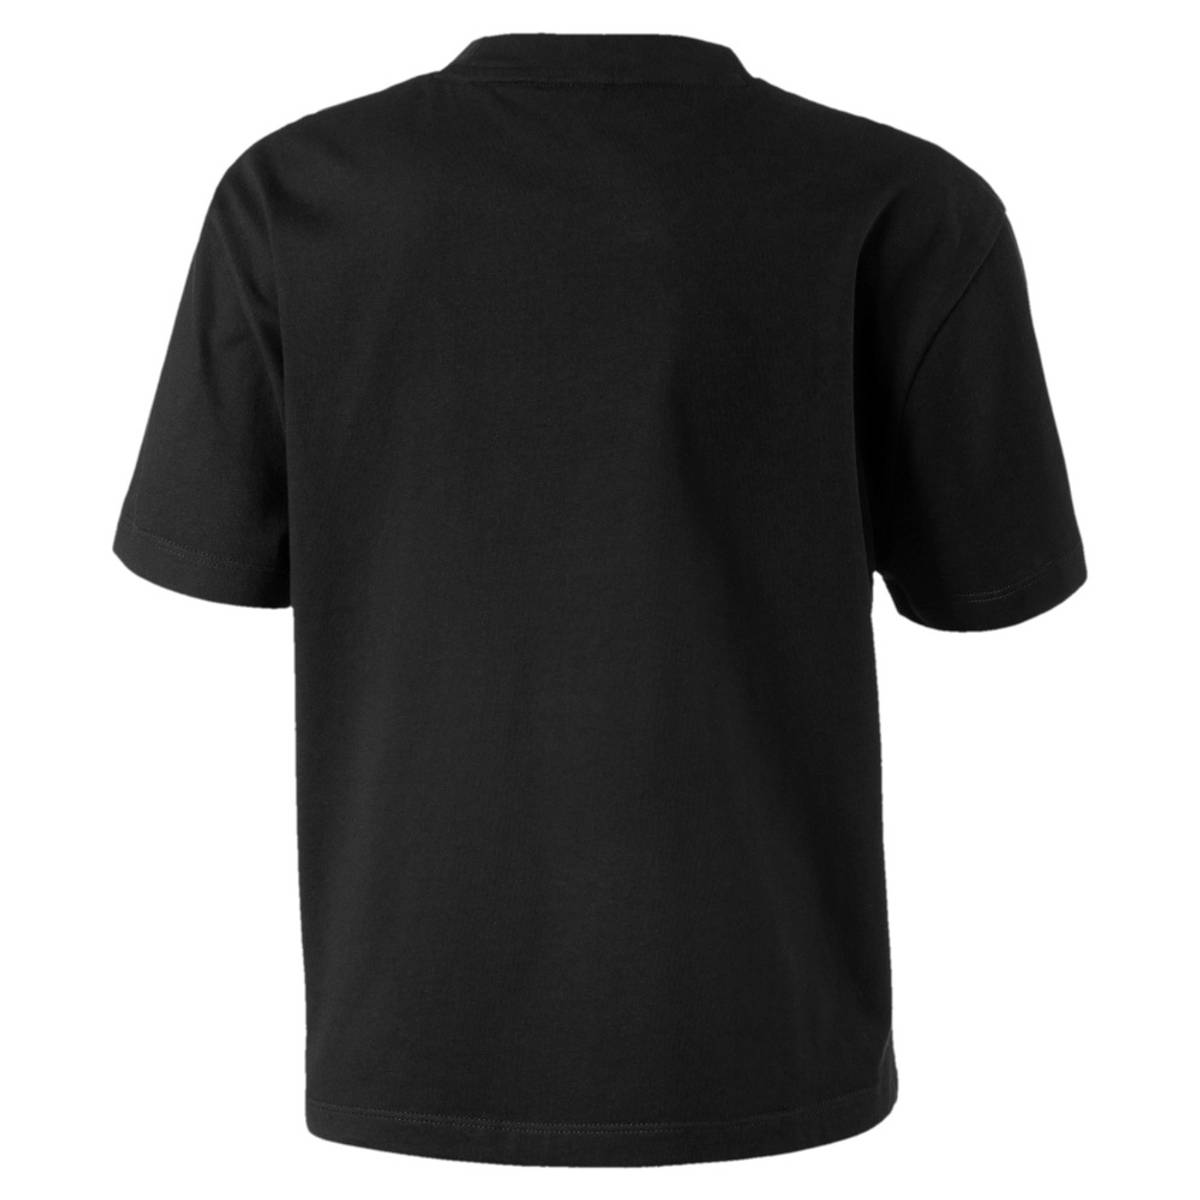 Sort Puma Alpha Aop Tee Girl T-skjorte